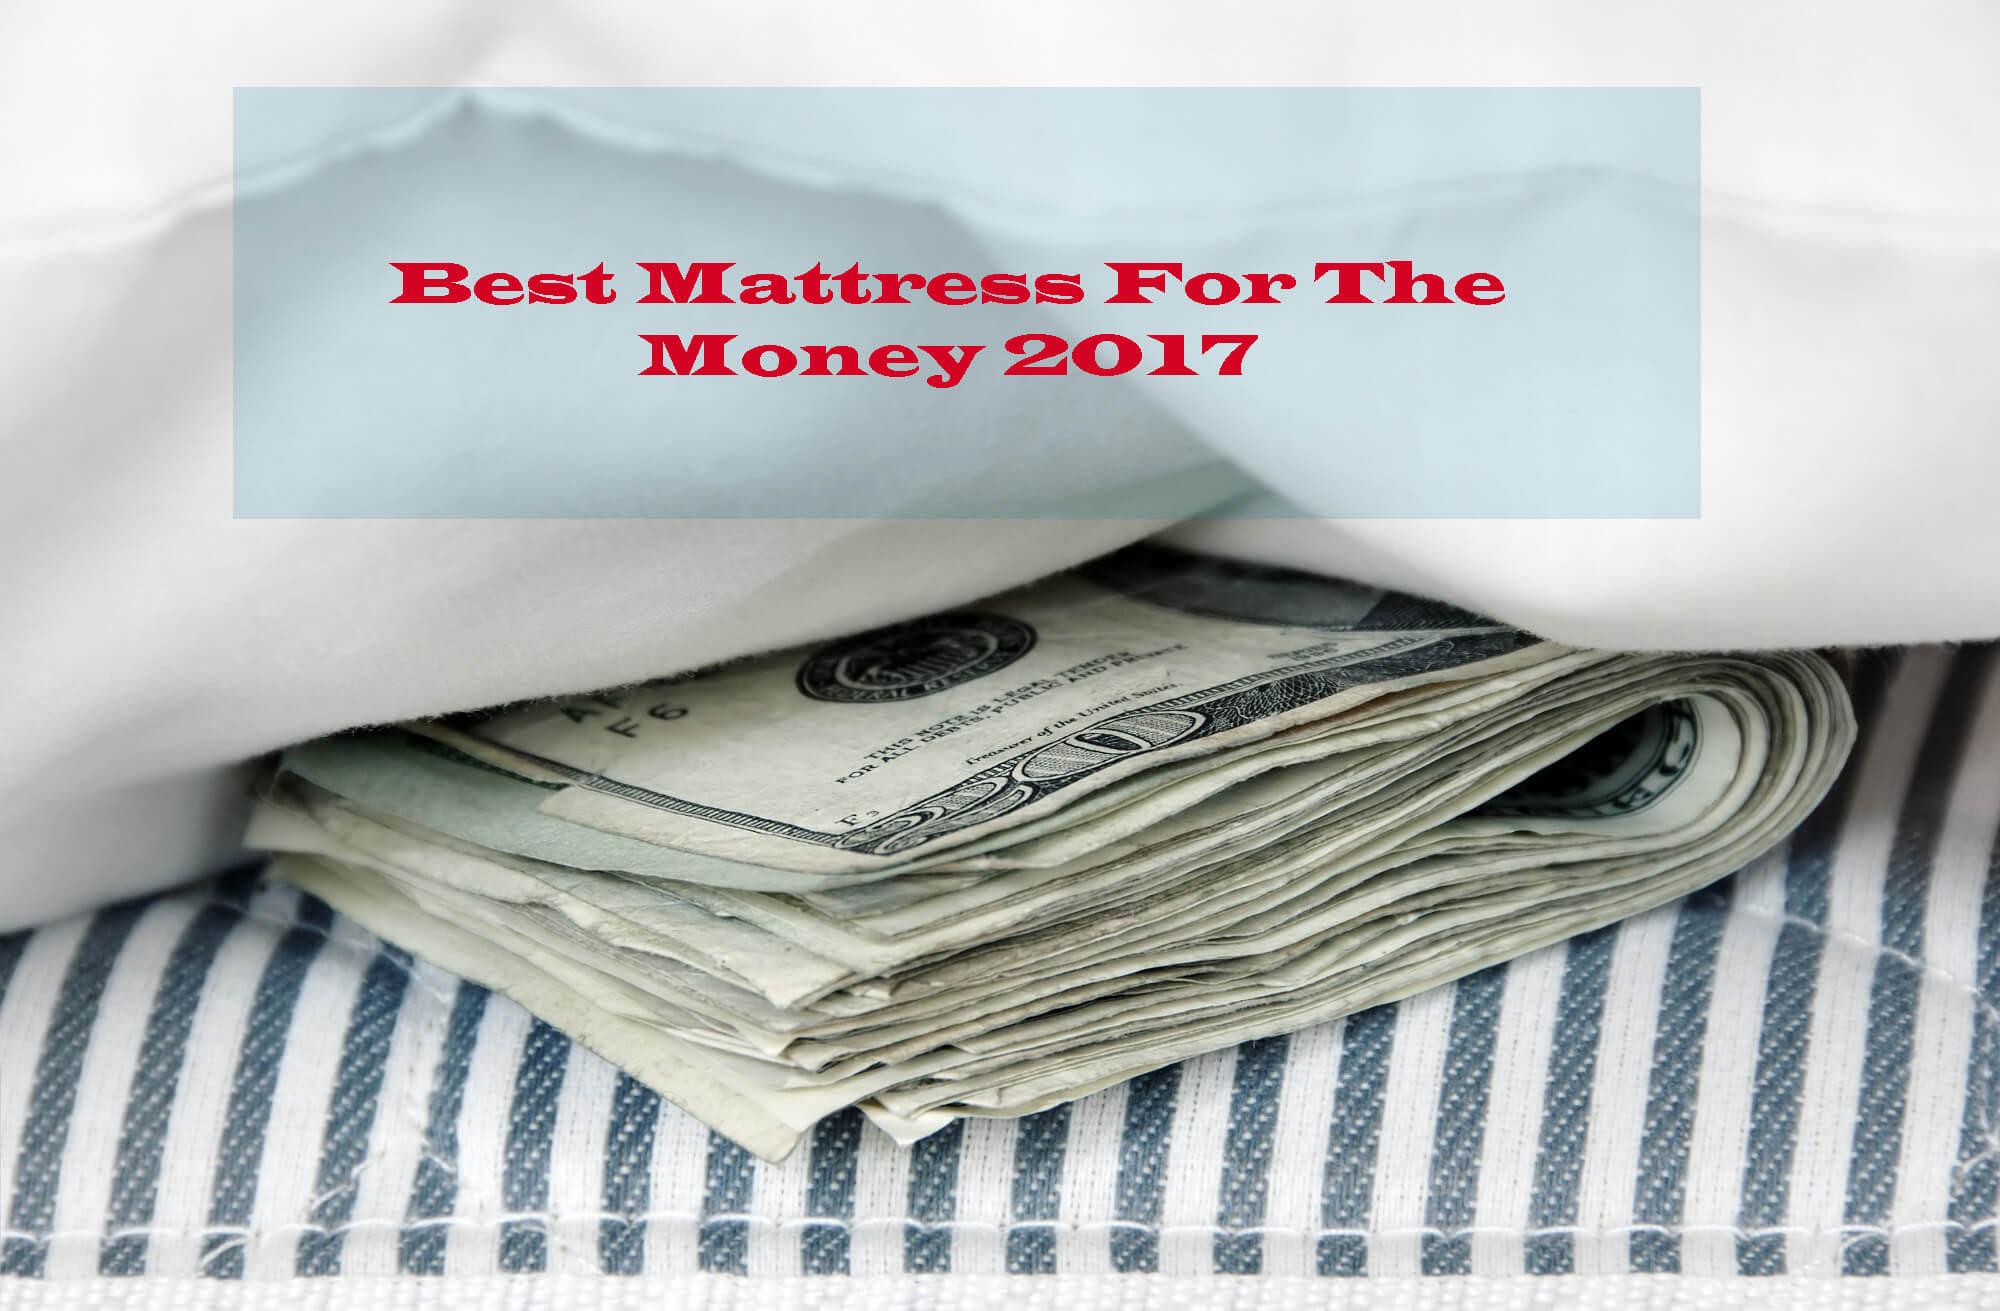 Best Mattress For The Money of Best Mattress in 2018 Community Counts